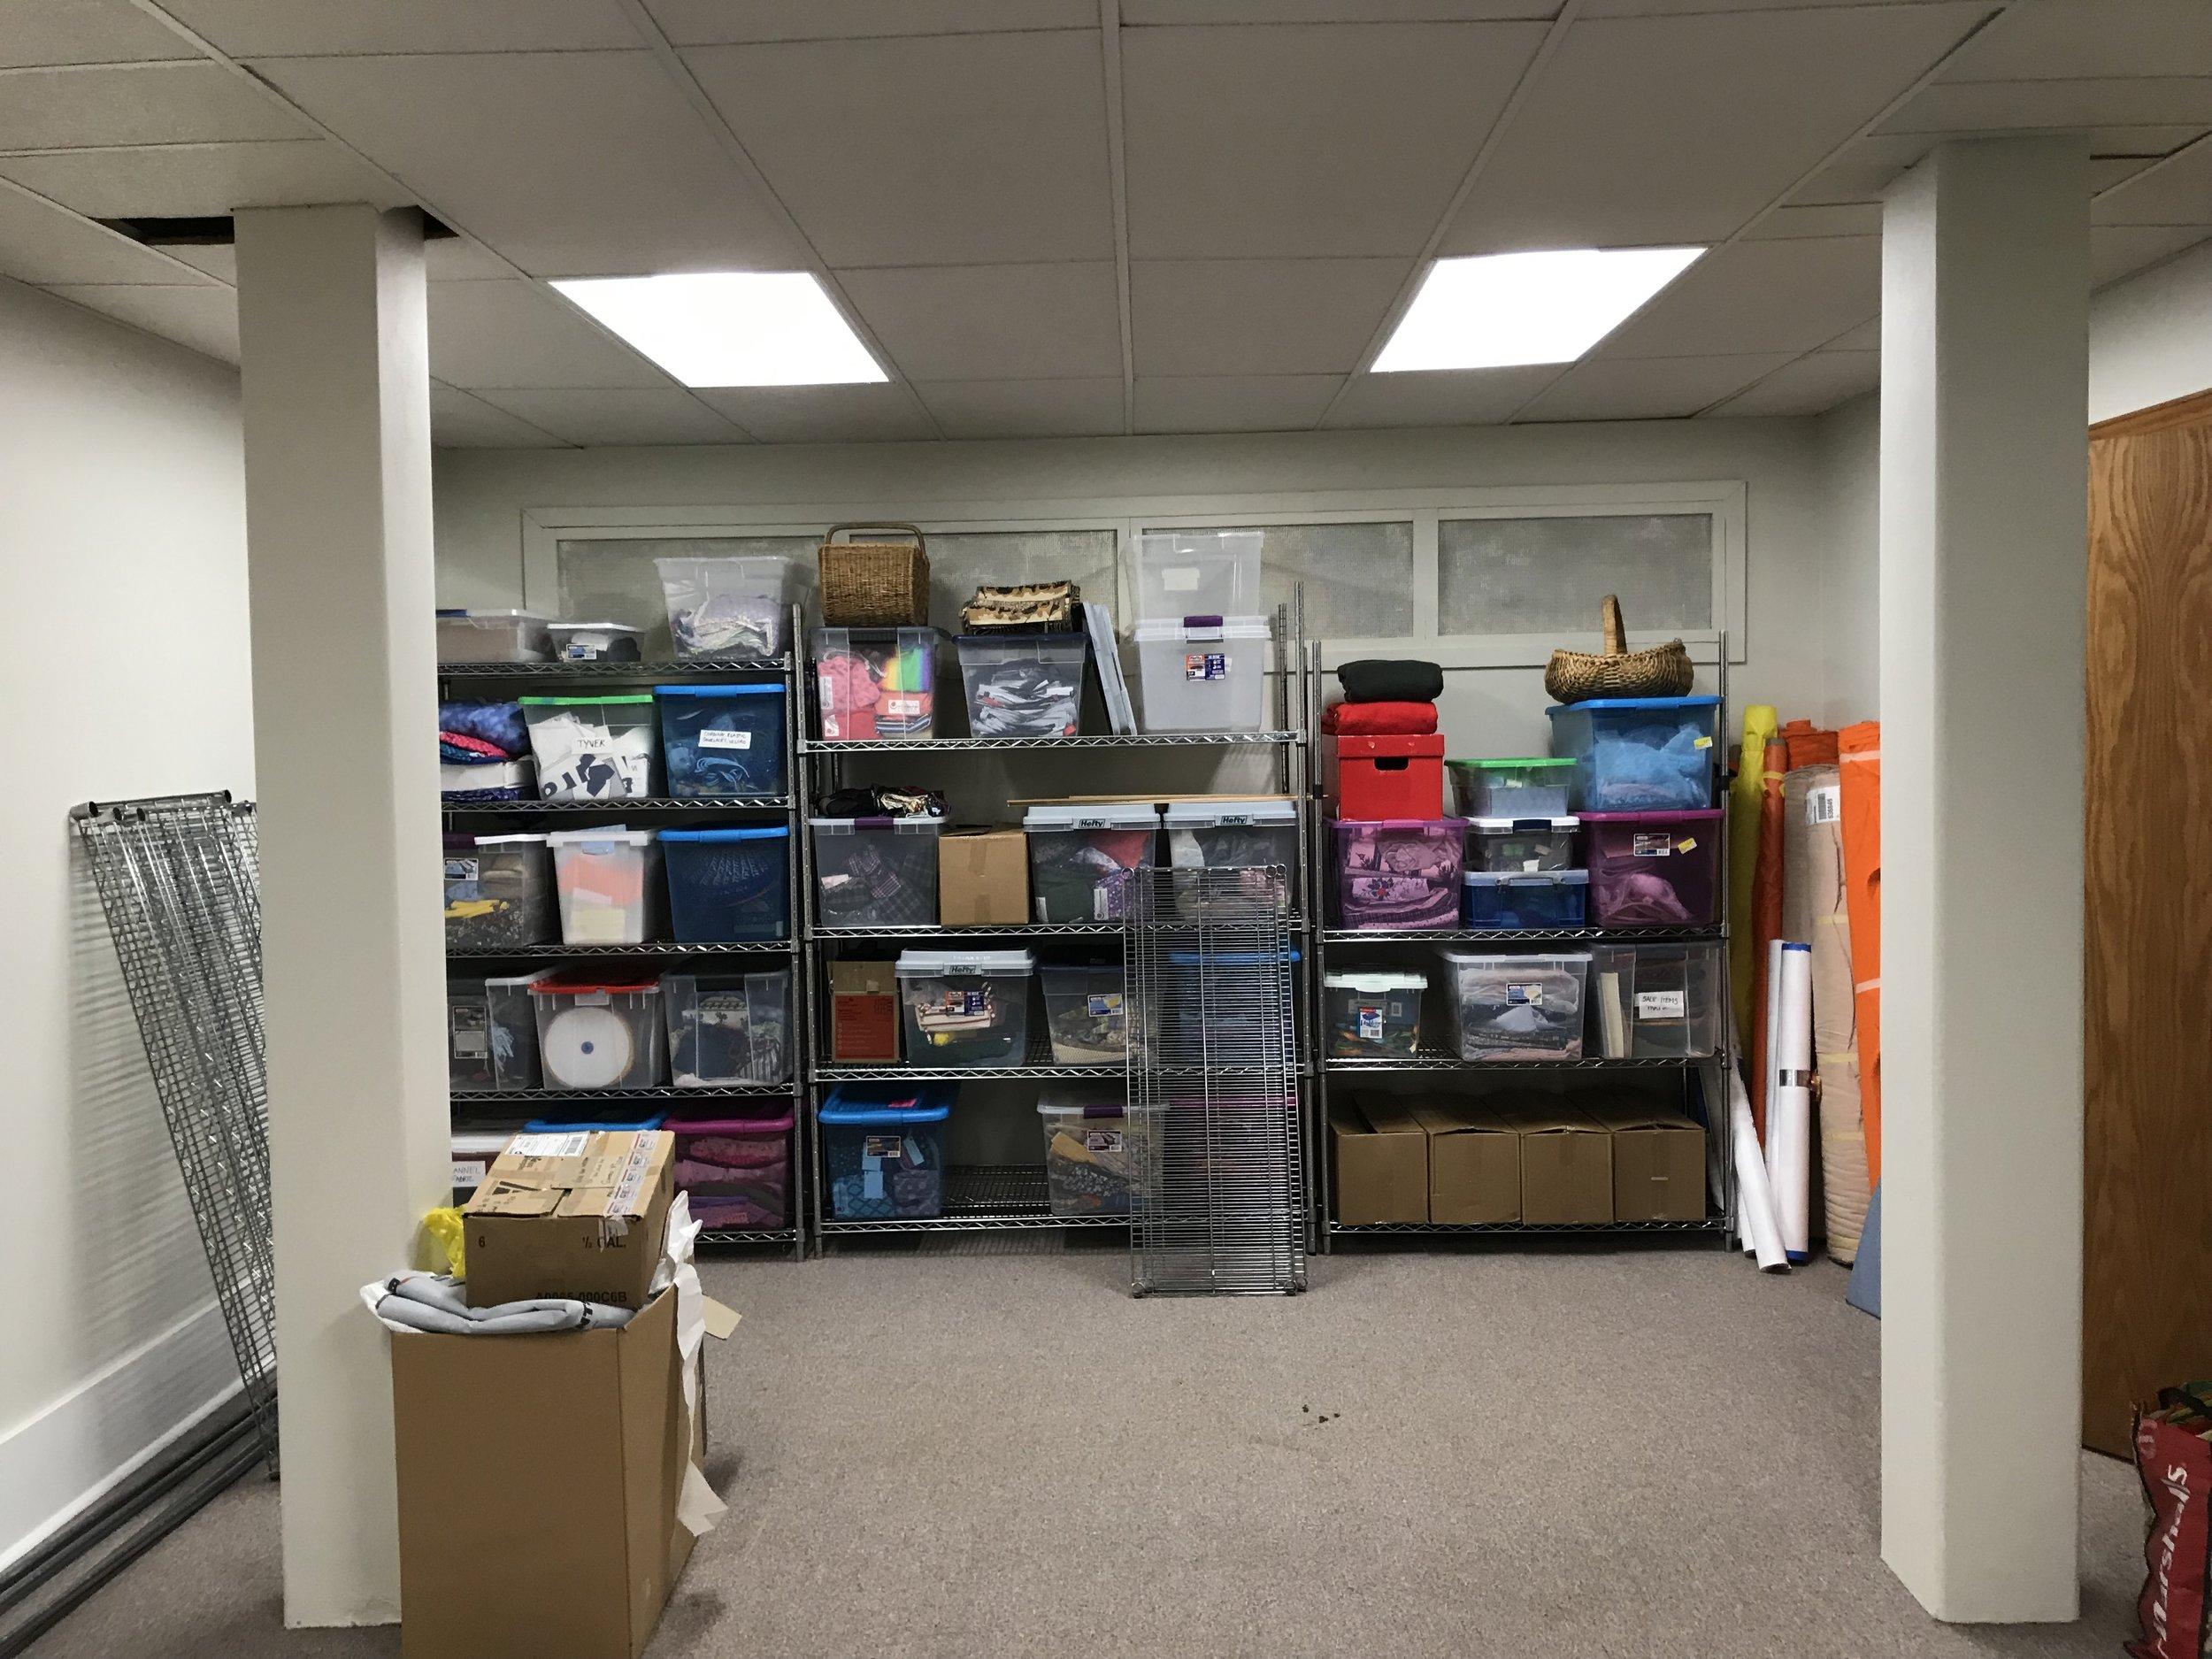 Shelves donated by Carpe Diem Coffee Roasters.